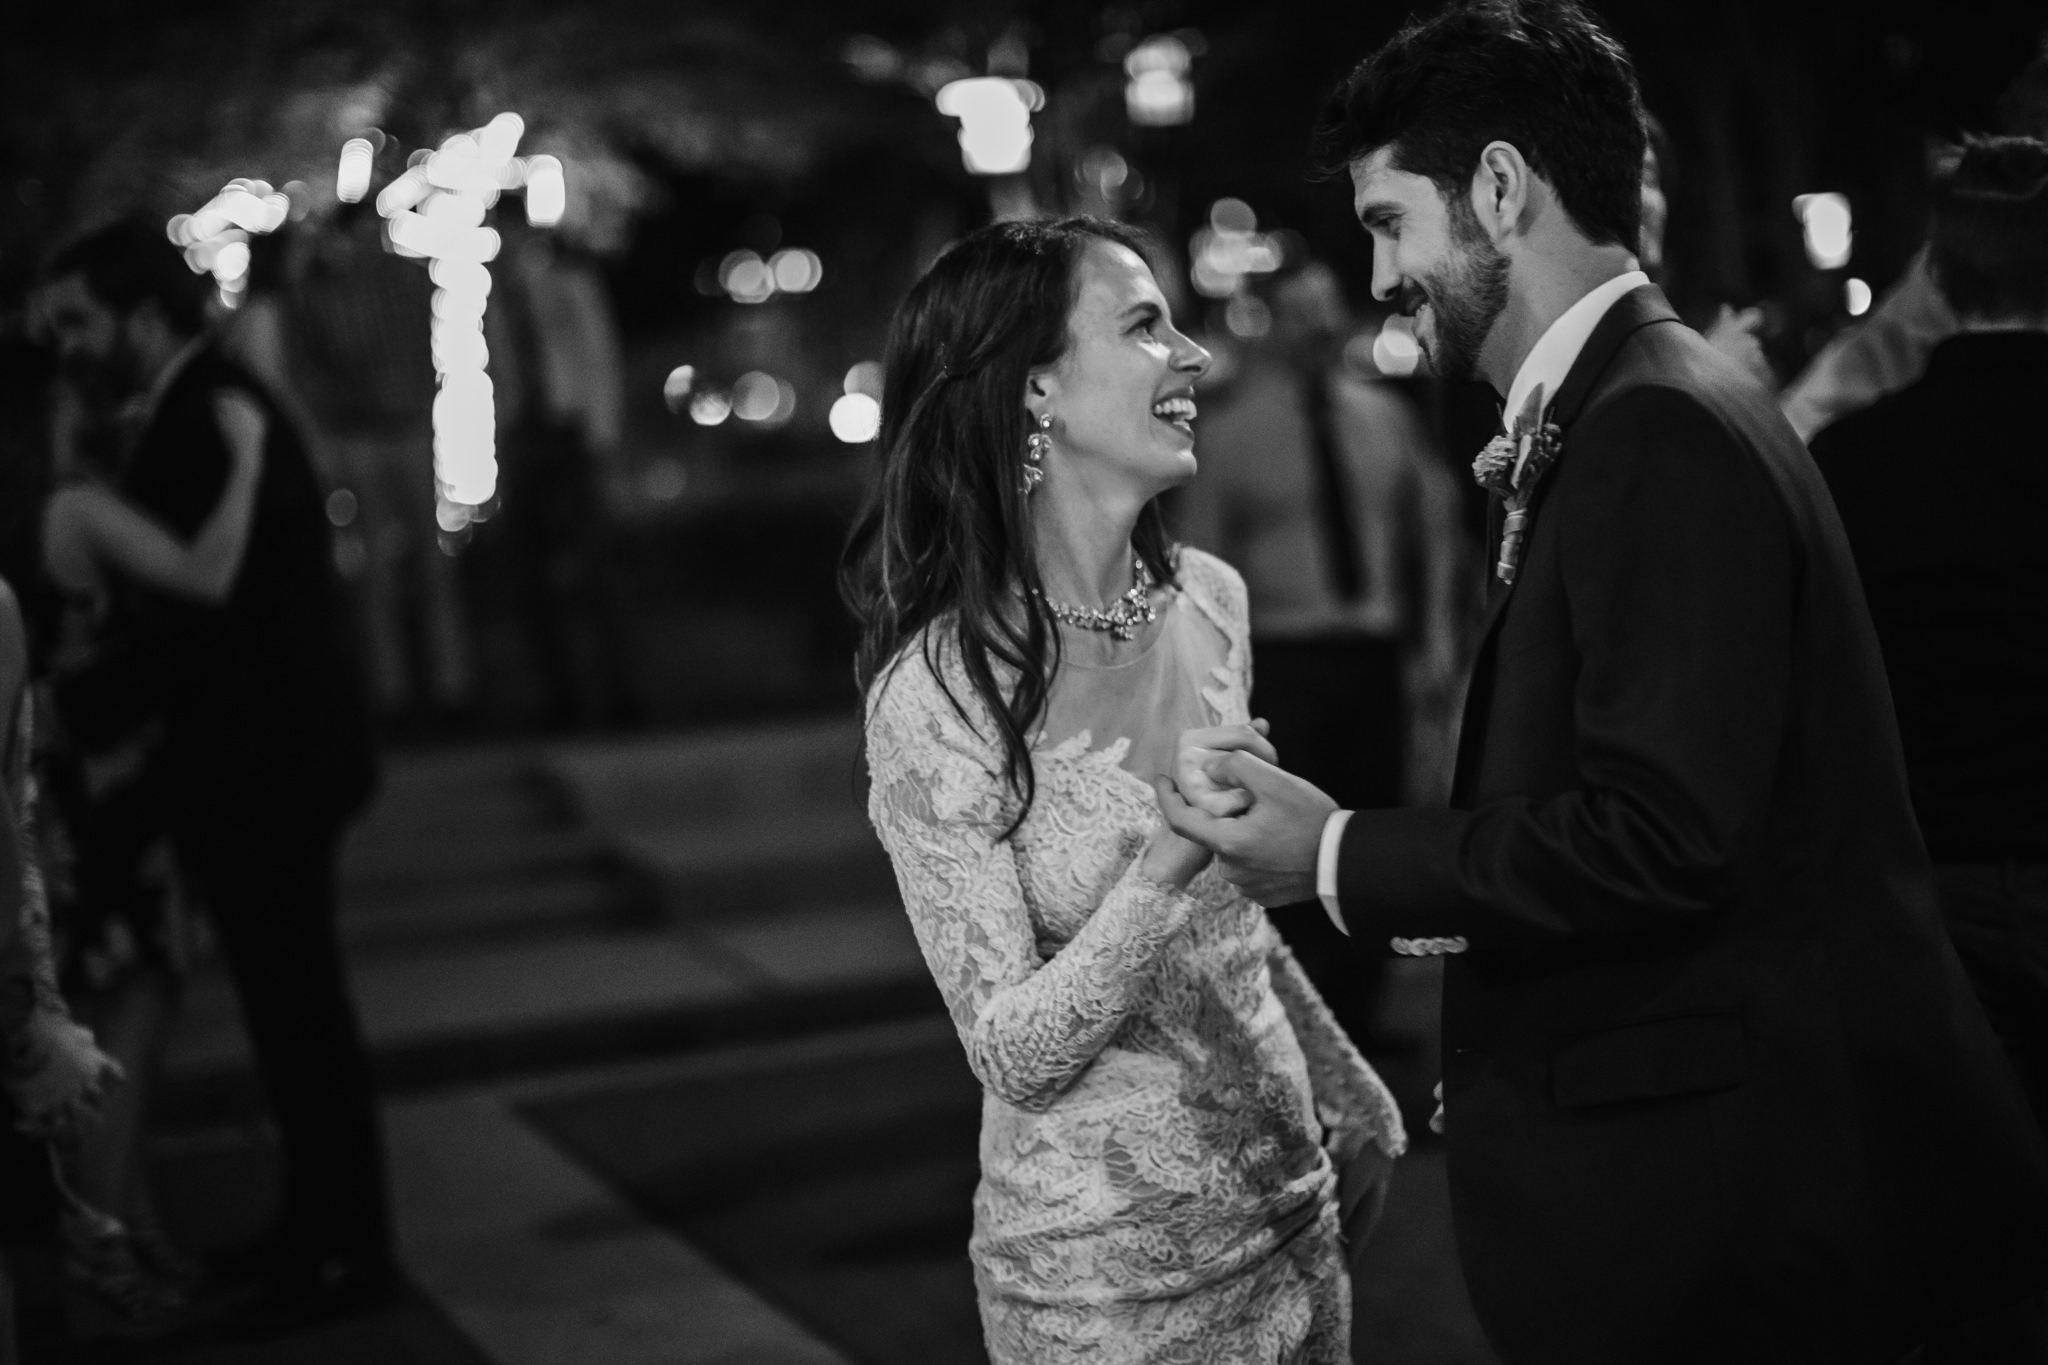 cassie-cook-photography-waterhouse-pavillon-chattanooga-wedding-venue-wedding-photography-folk-wedding